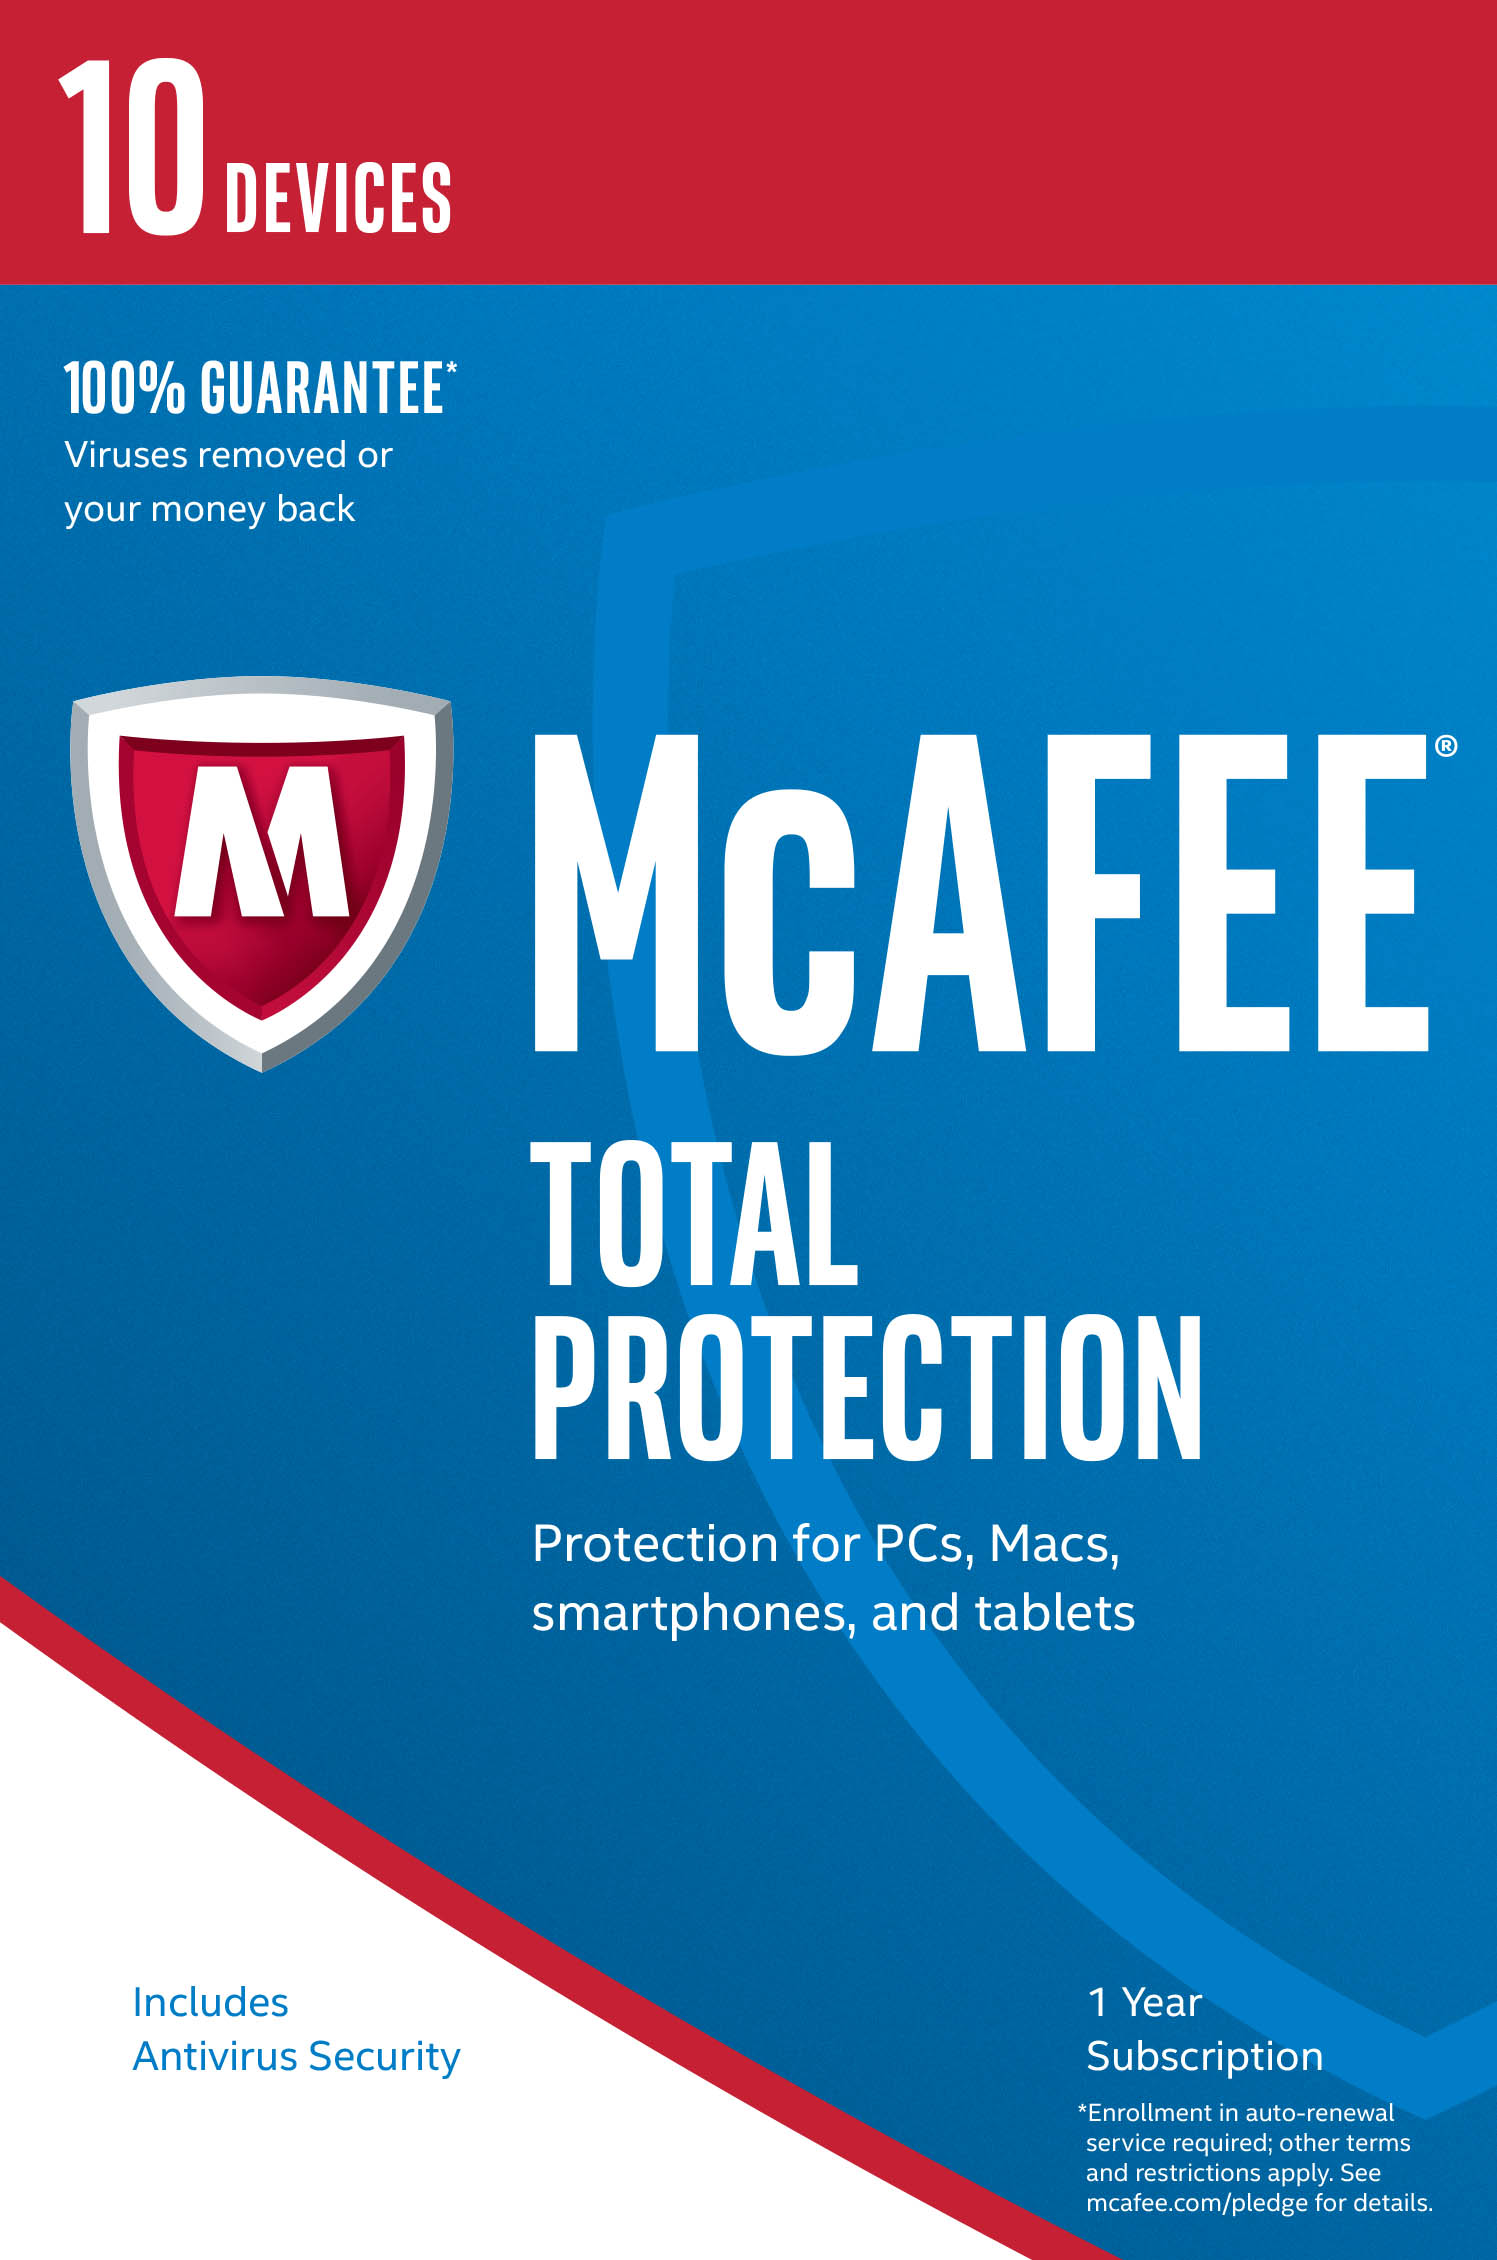 mcafee virusscan for mac v9.1